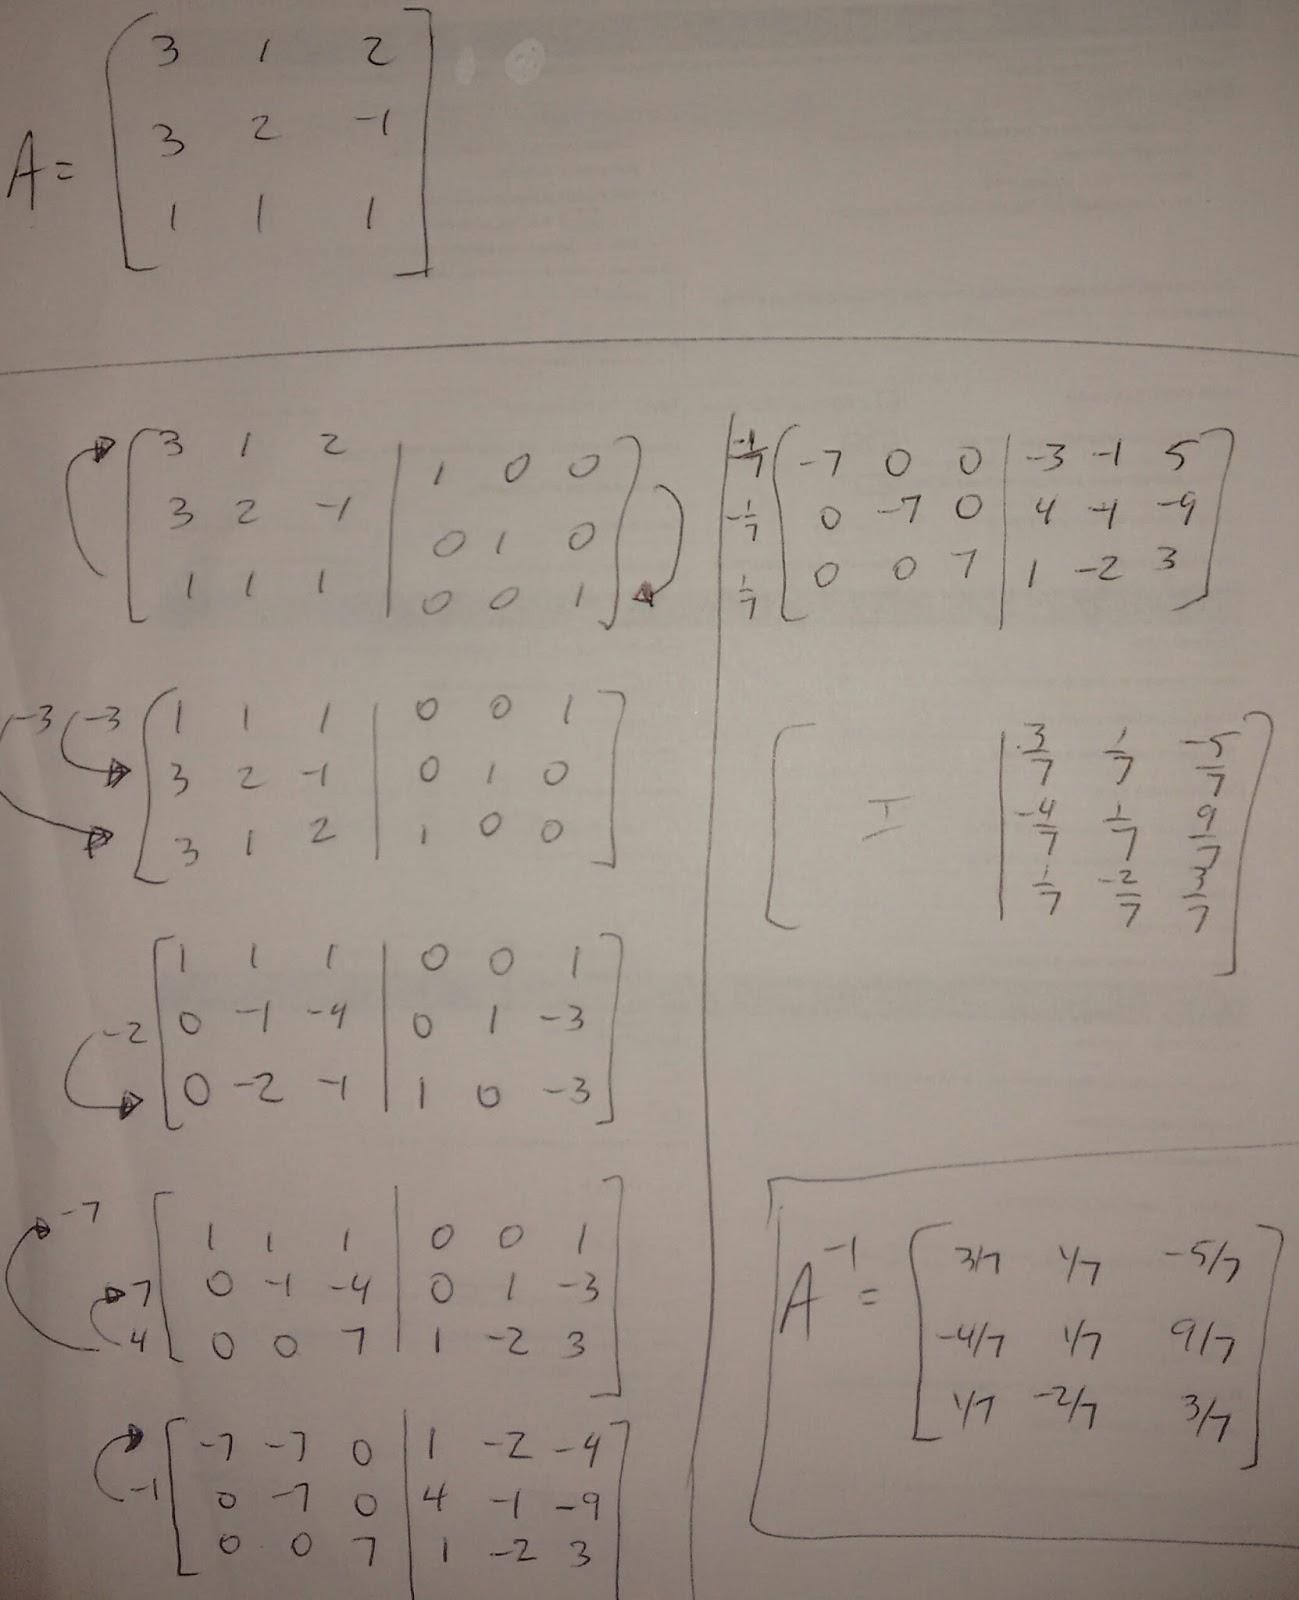 how to find poi algebraically